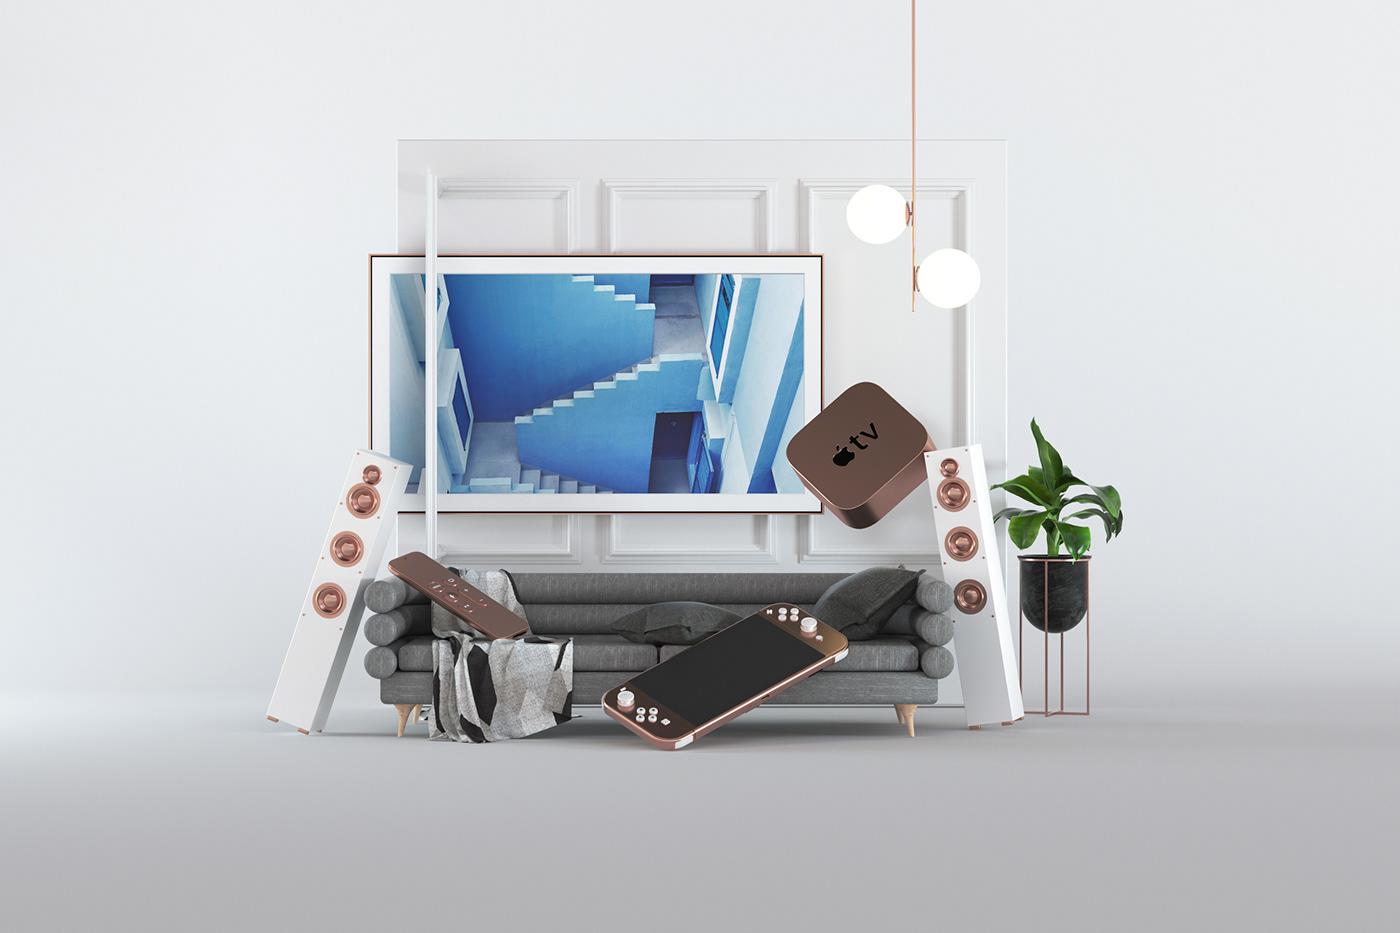 3D octane c4d stilllife design furniture styling  set deisgn